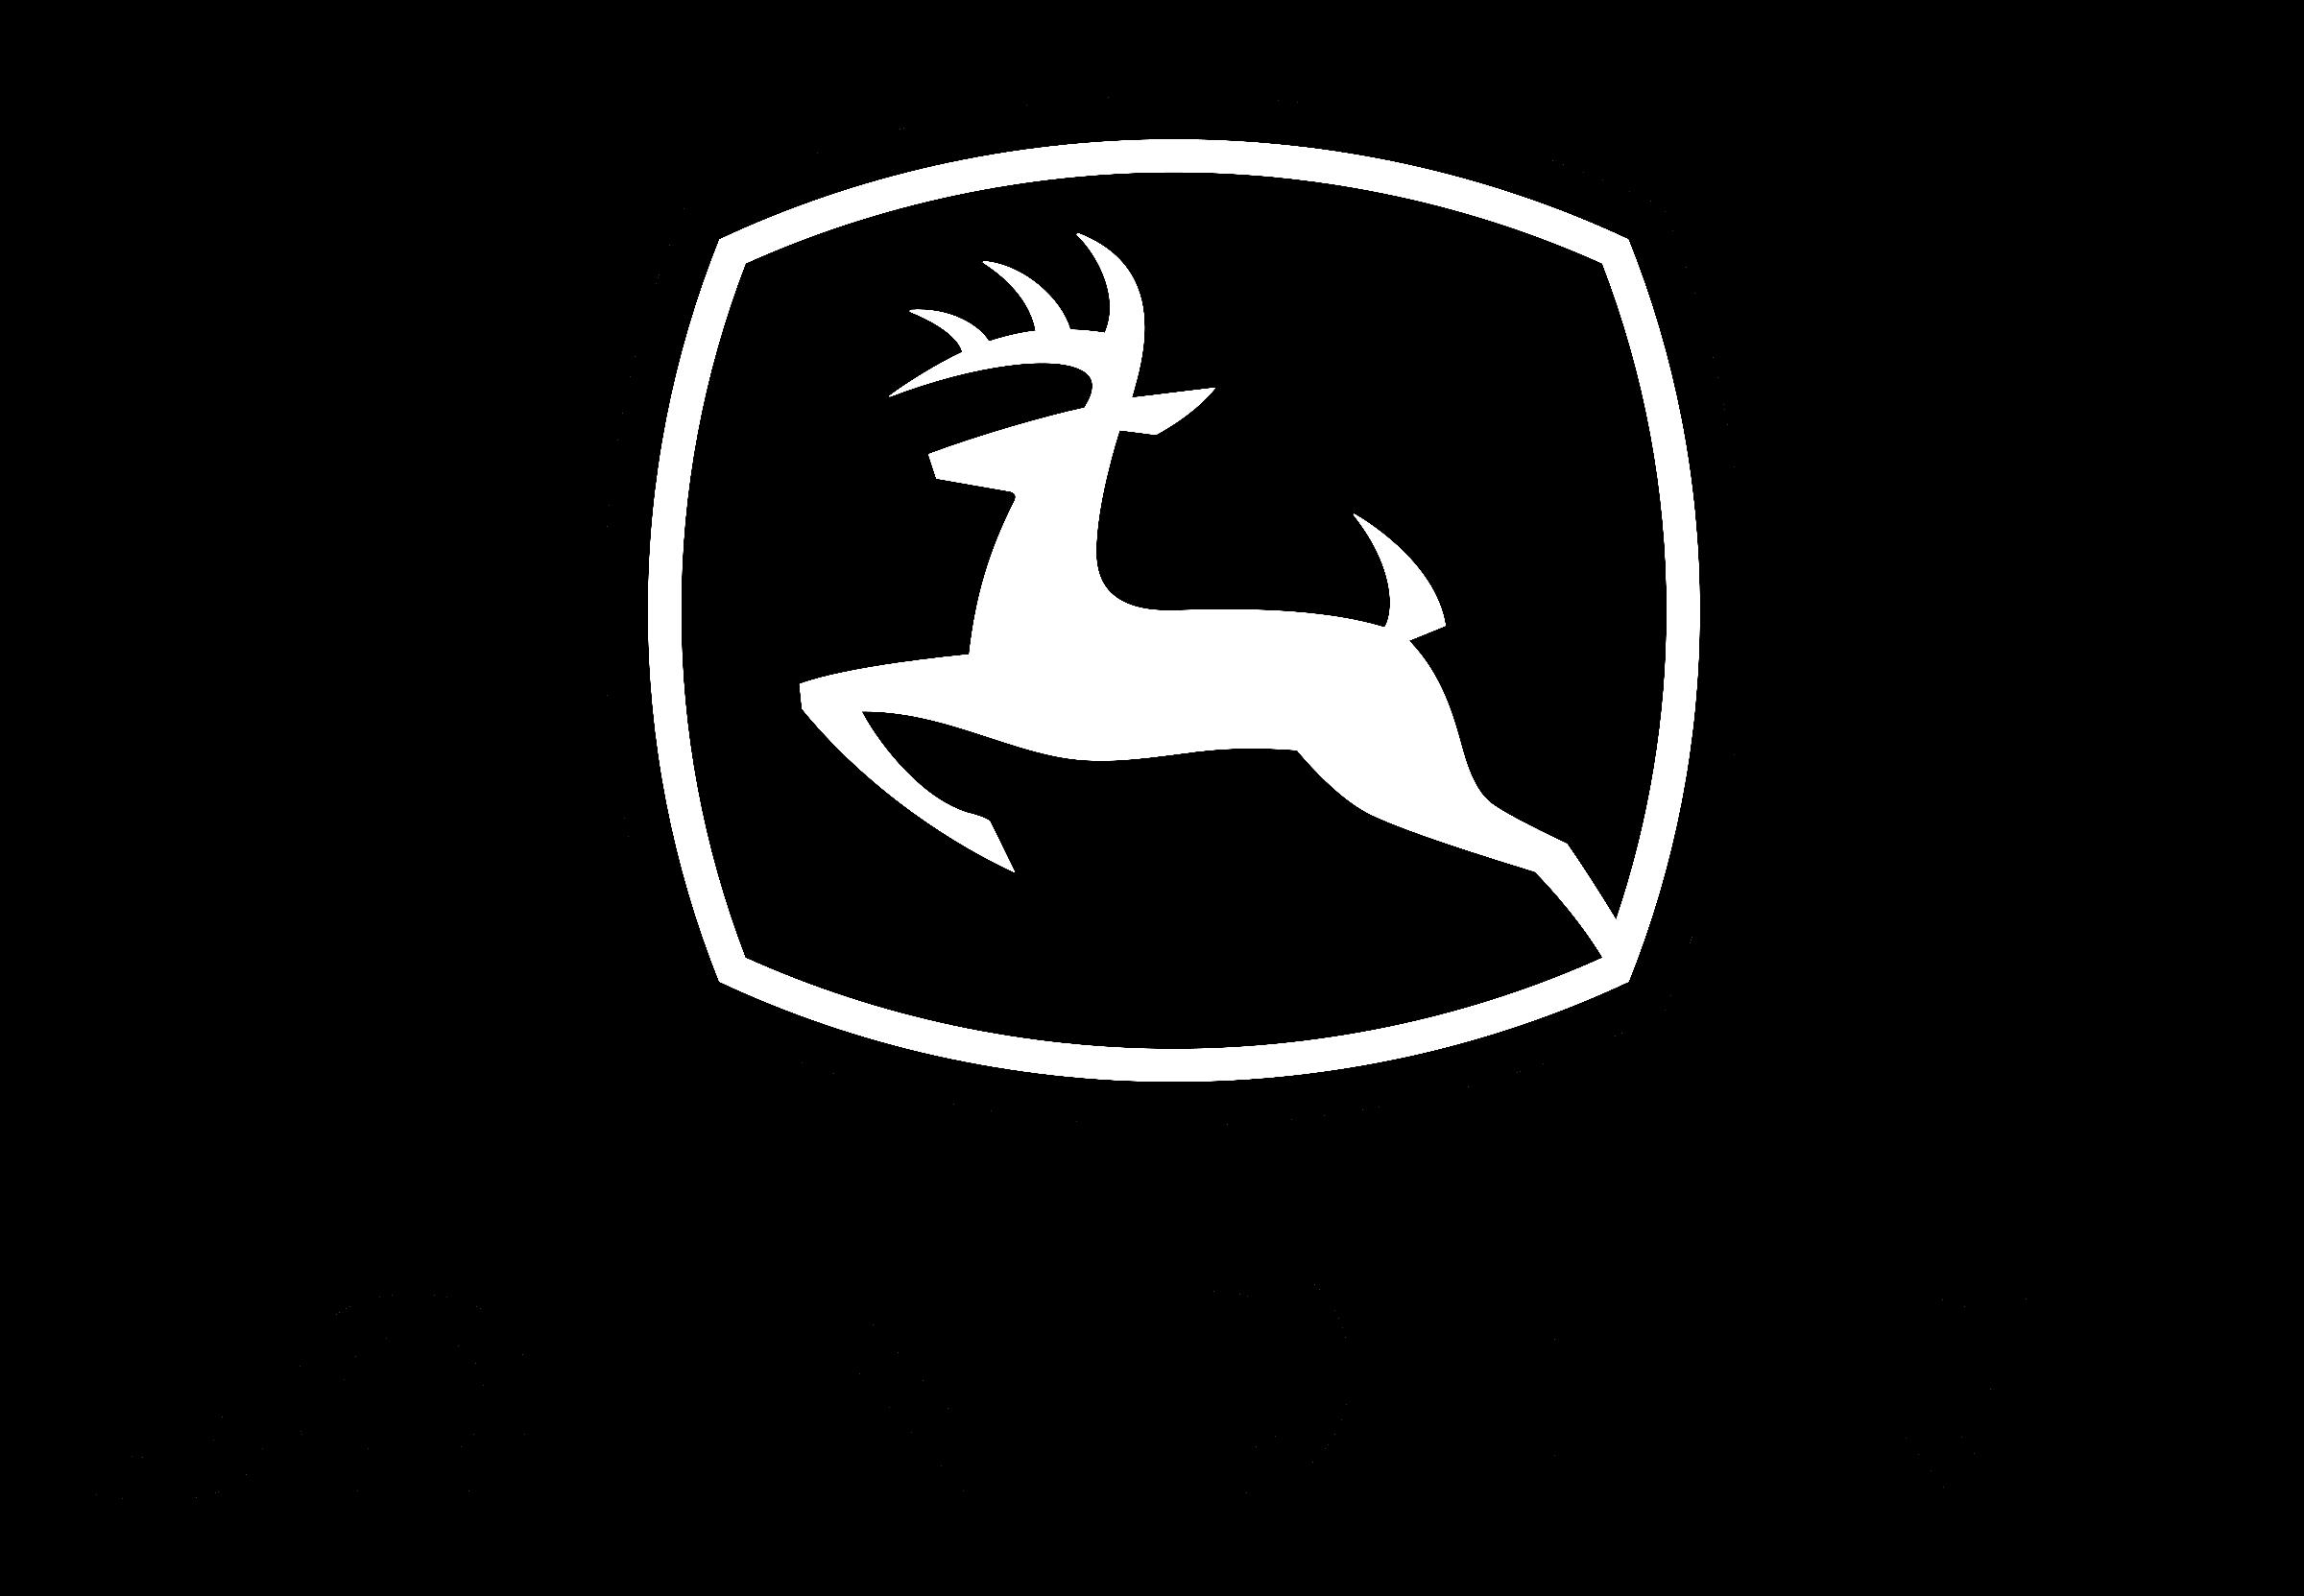 john-deere-logo-black-and-white.png